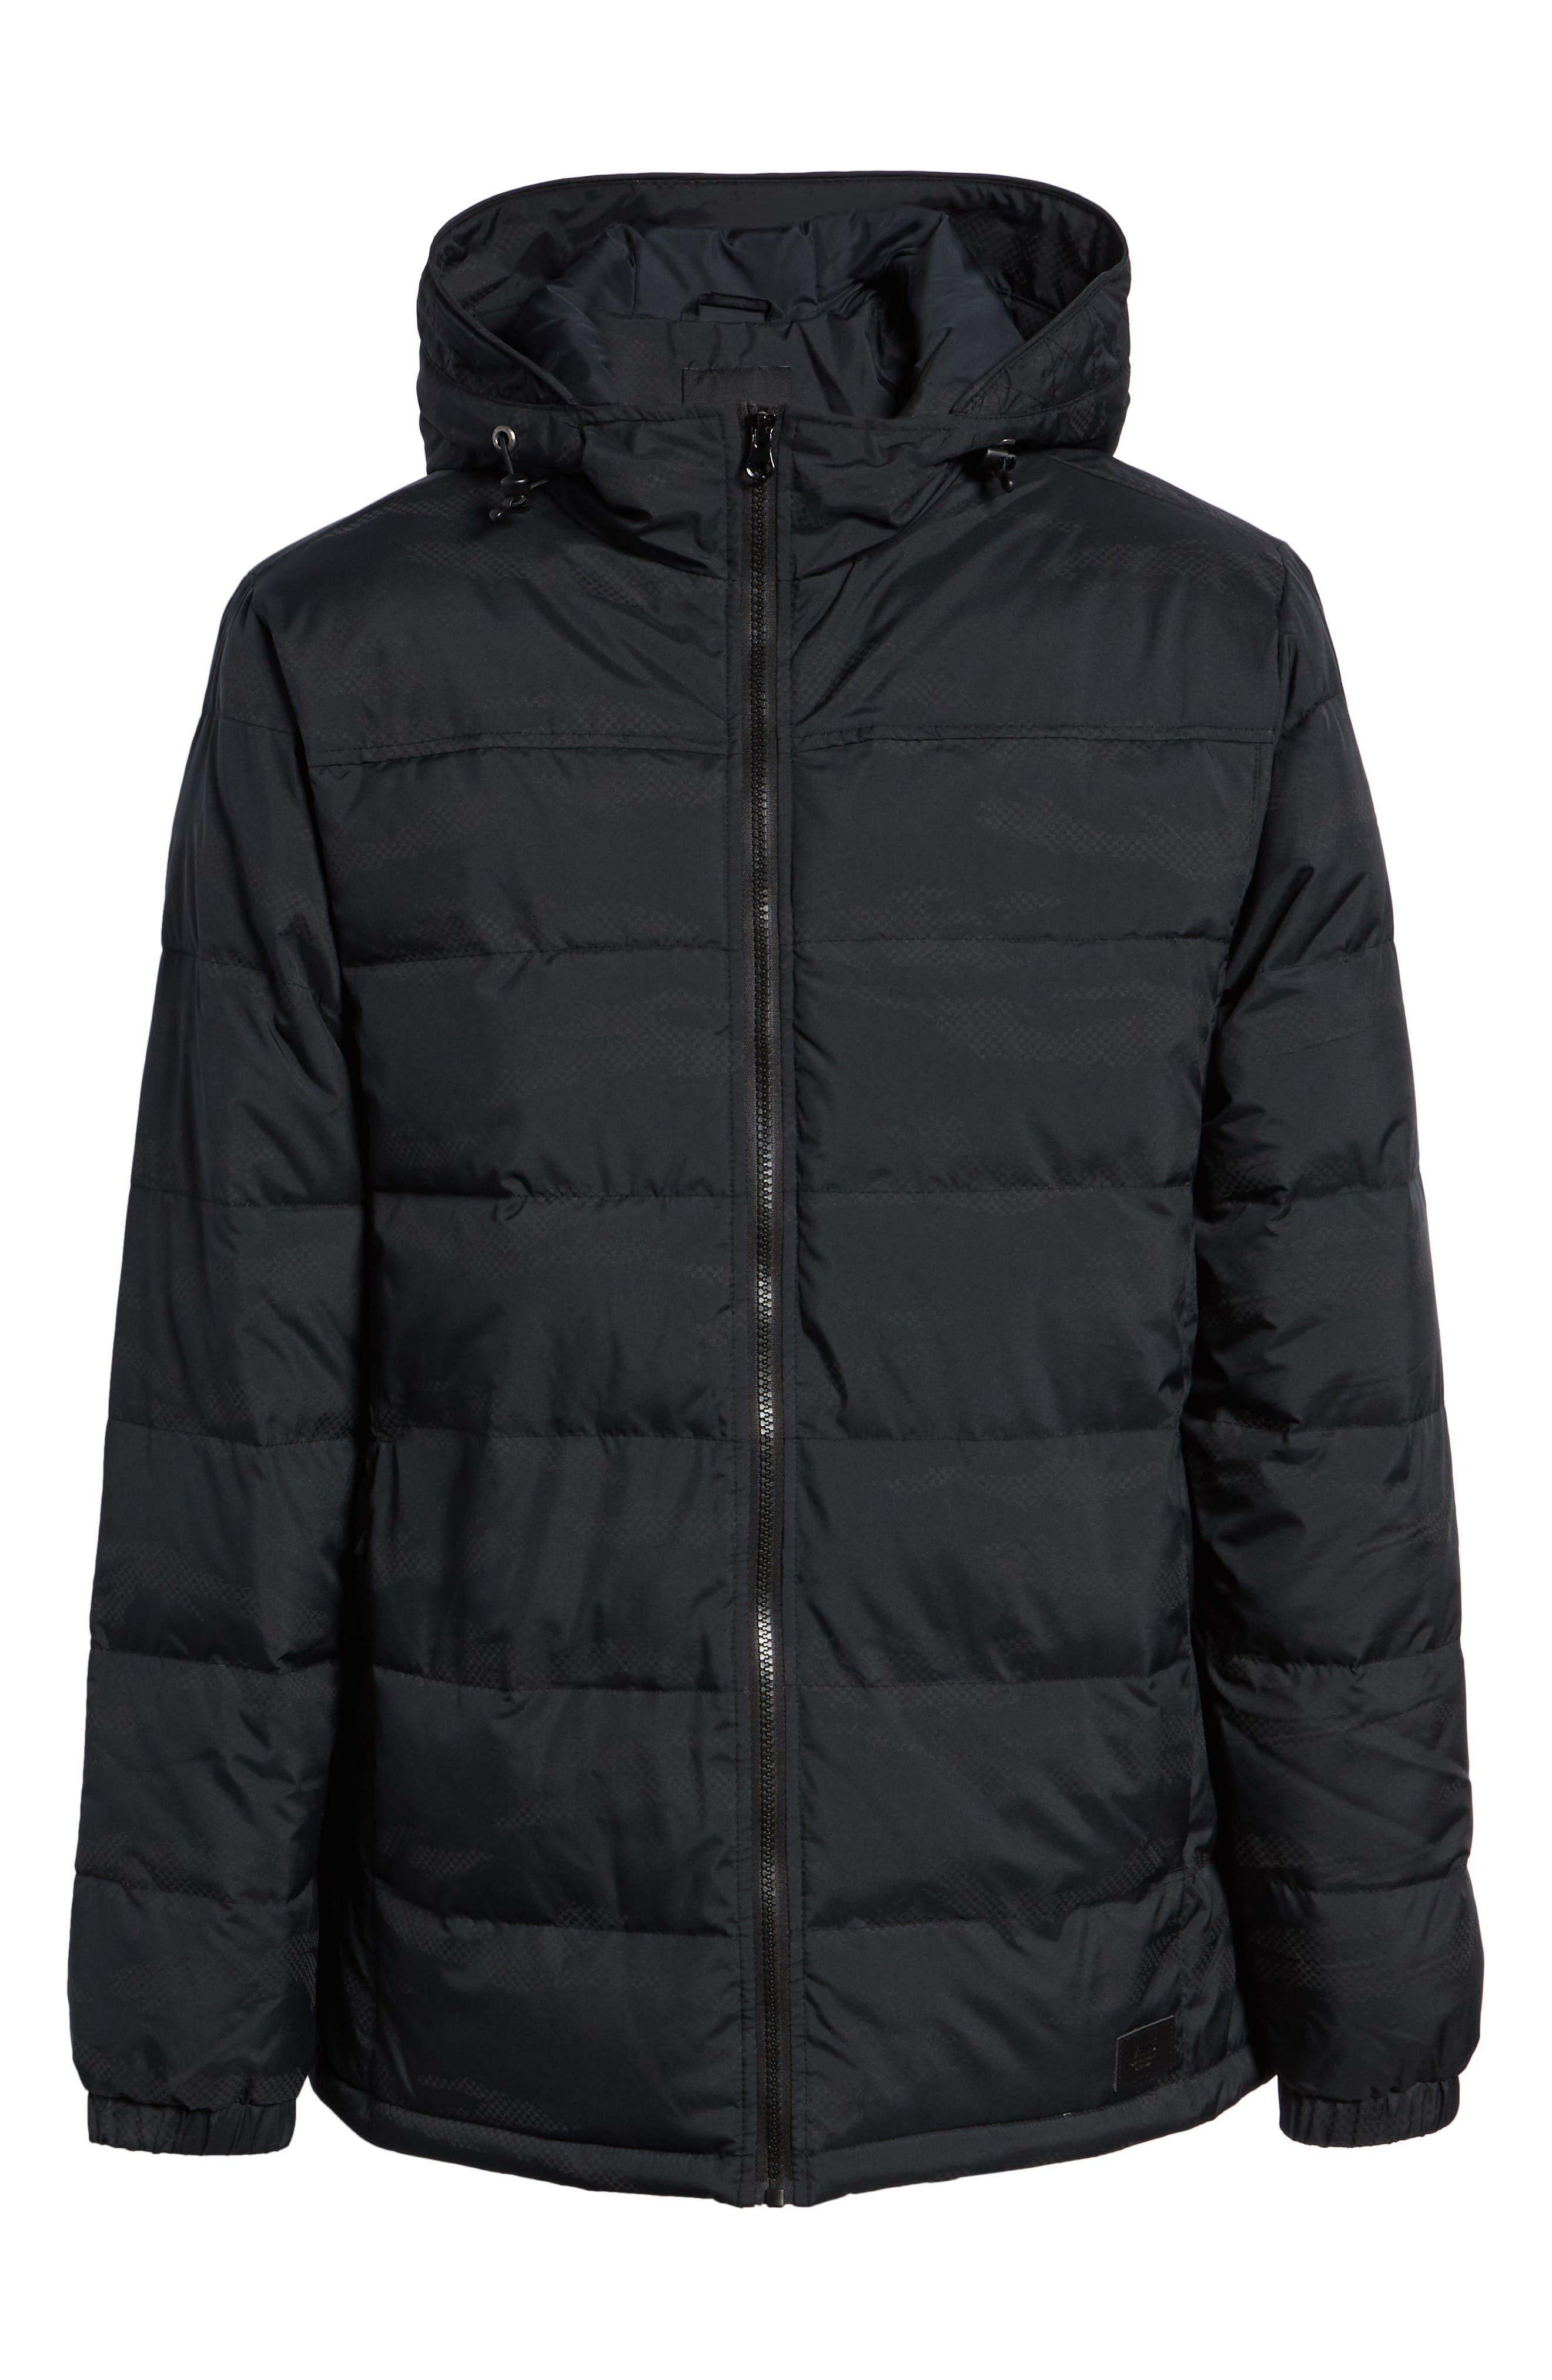 Woodcrest MTE Jacket,                             Alternate thumbnail 6, color,                             BLACK REFLECTIVE